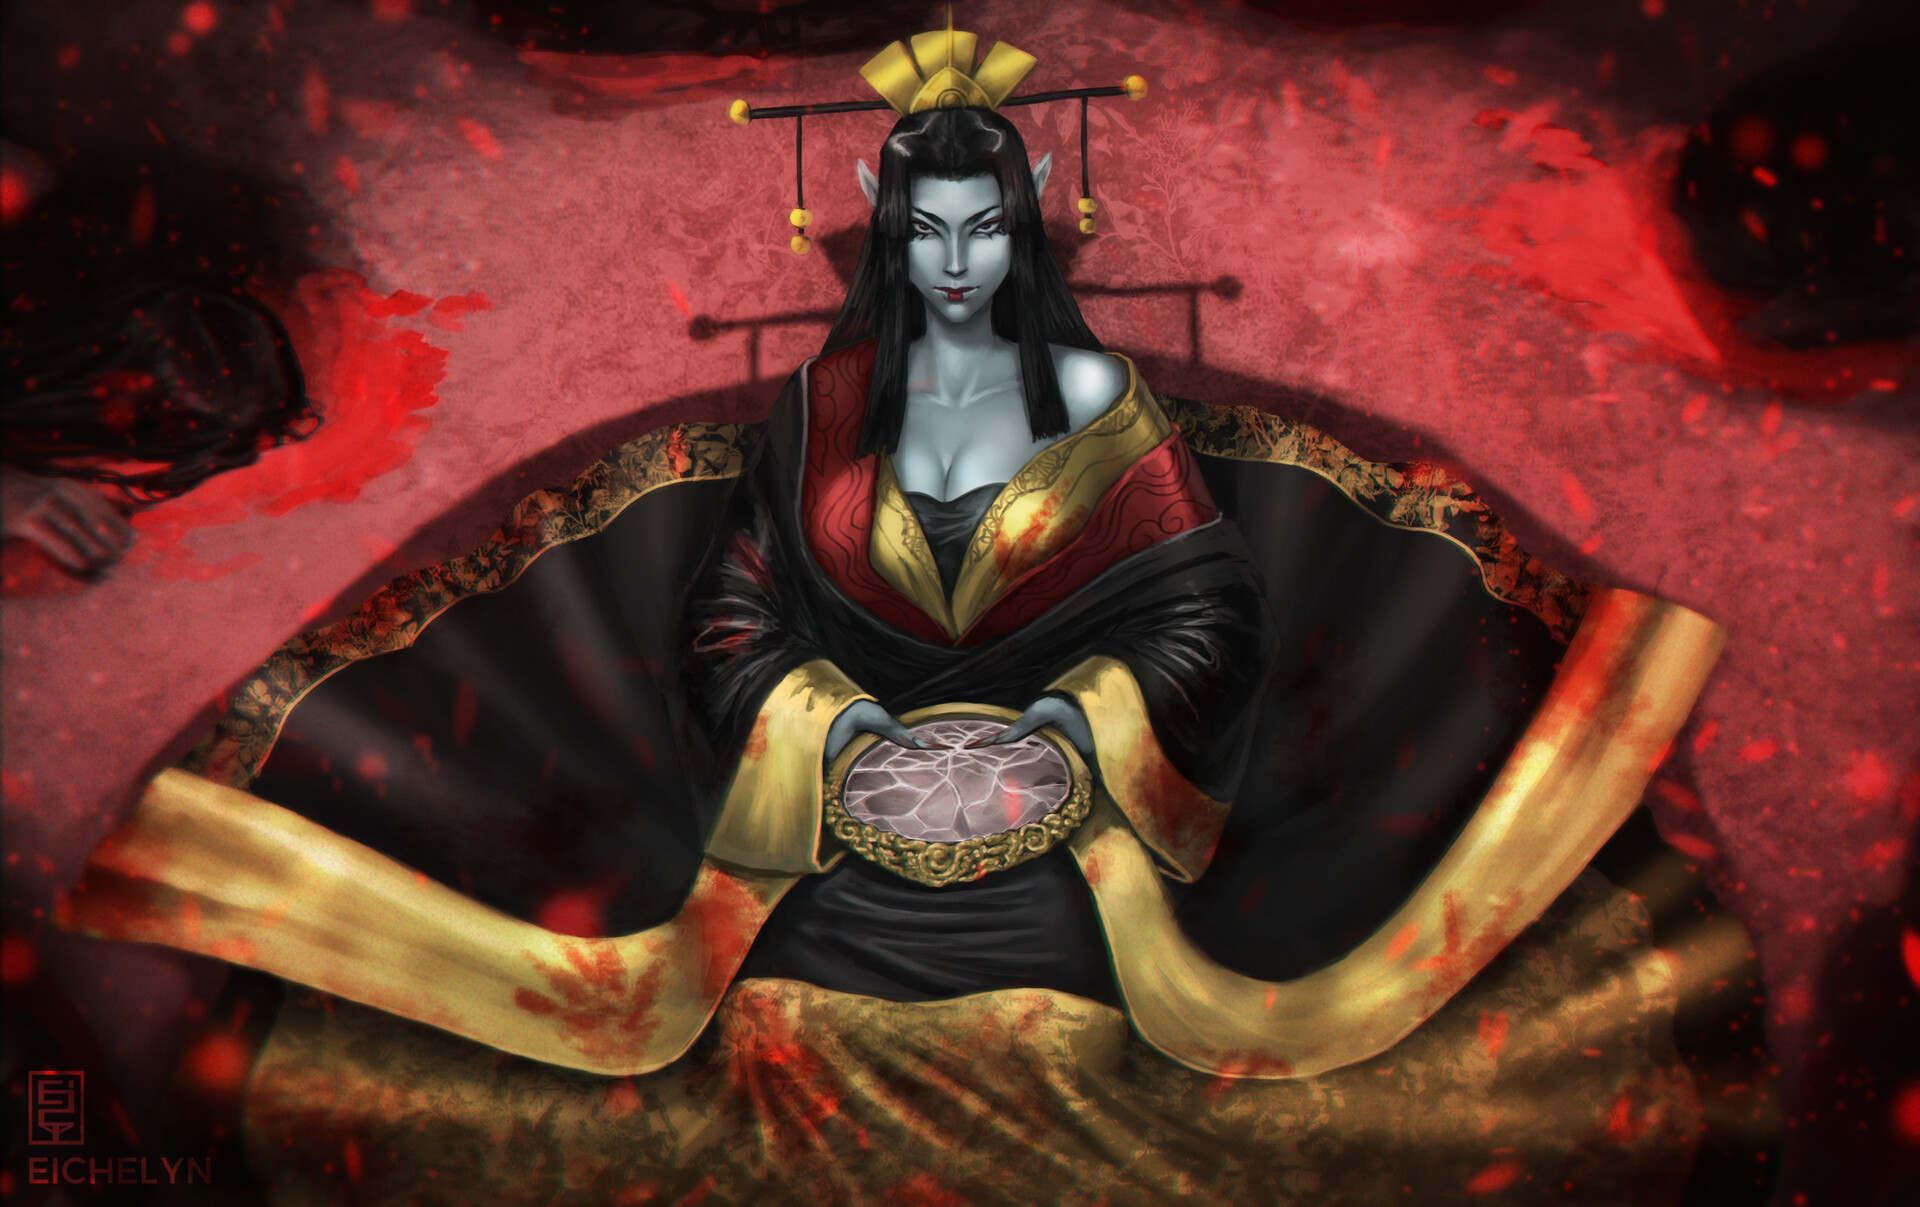 Chou (Castlevania) Image #2963694 - Zerochan Anime Image Board